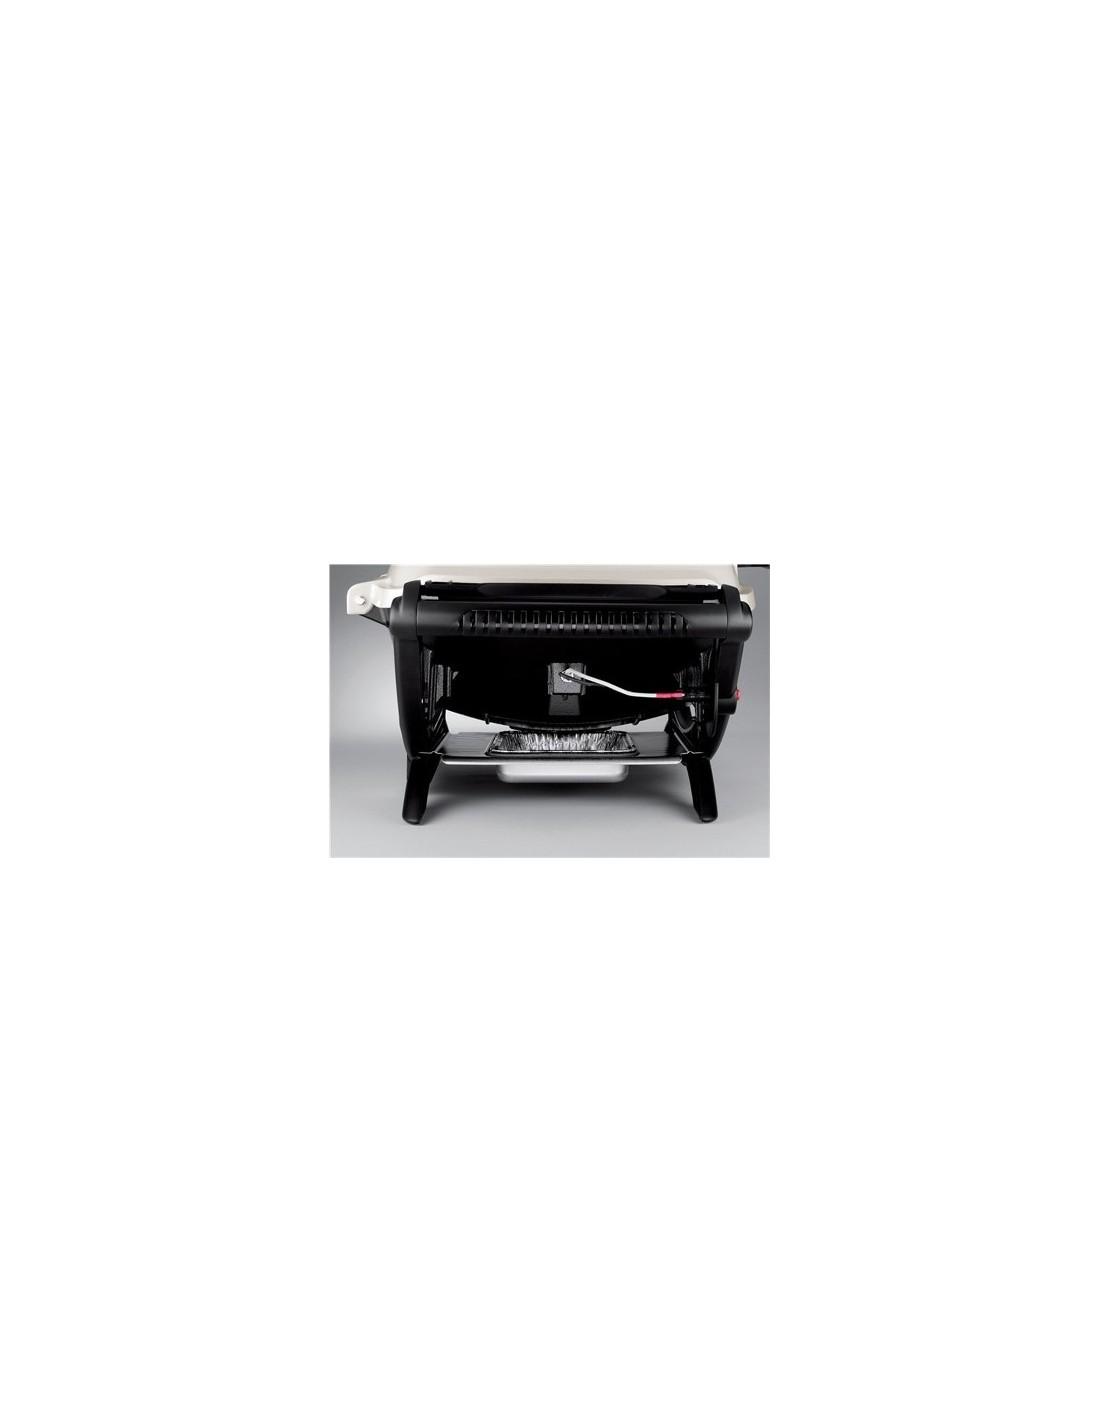 pack barbecue gaz q 2000 titanium weber chariot pliant 6557. Black Bedroom Furniture Sets. Home Design Ideas